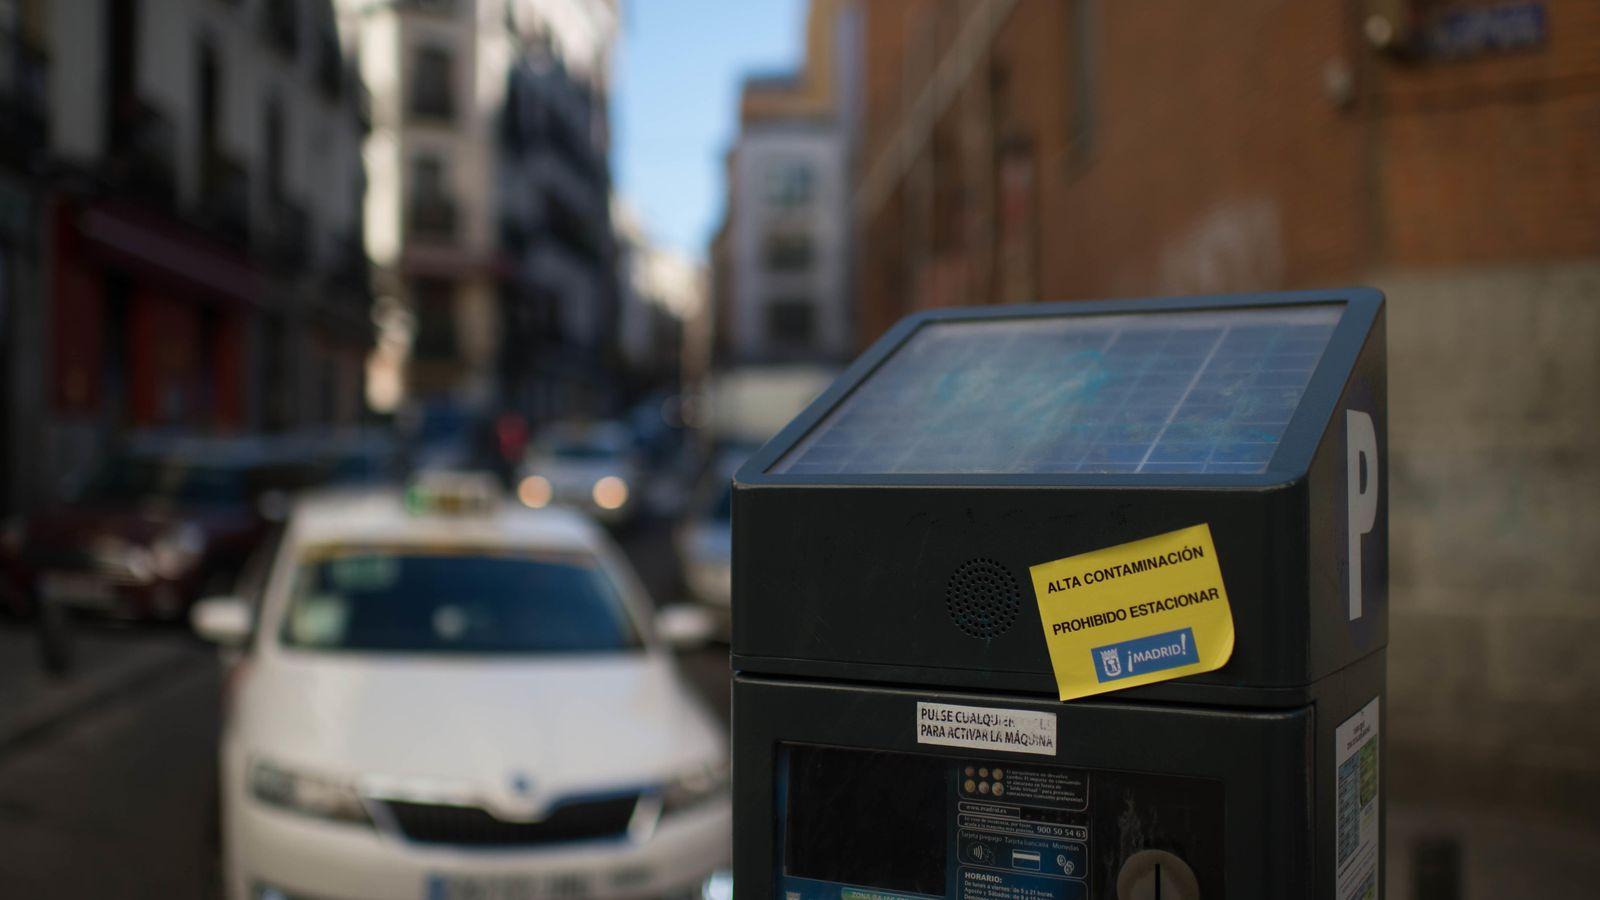 Zona SER Madrid: Trabajar vigilando parquímetros: mileurista ...